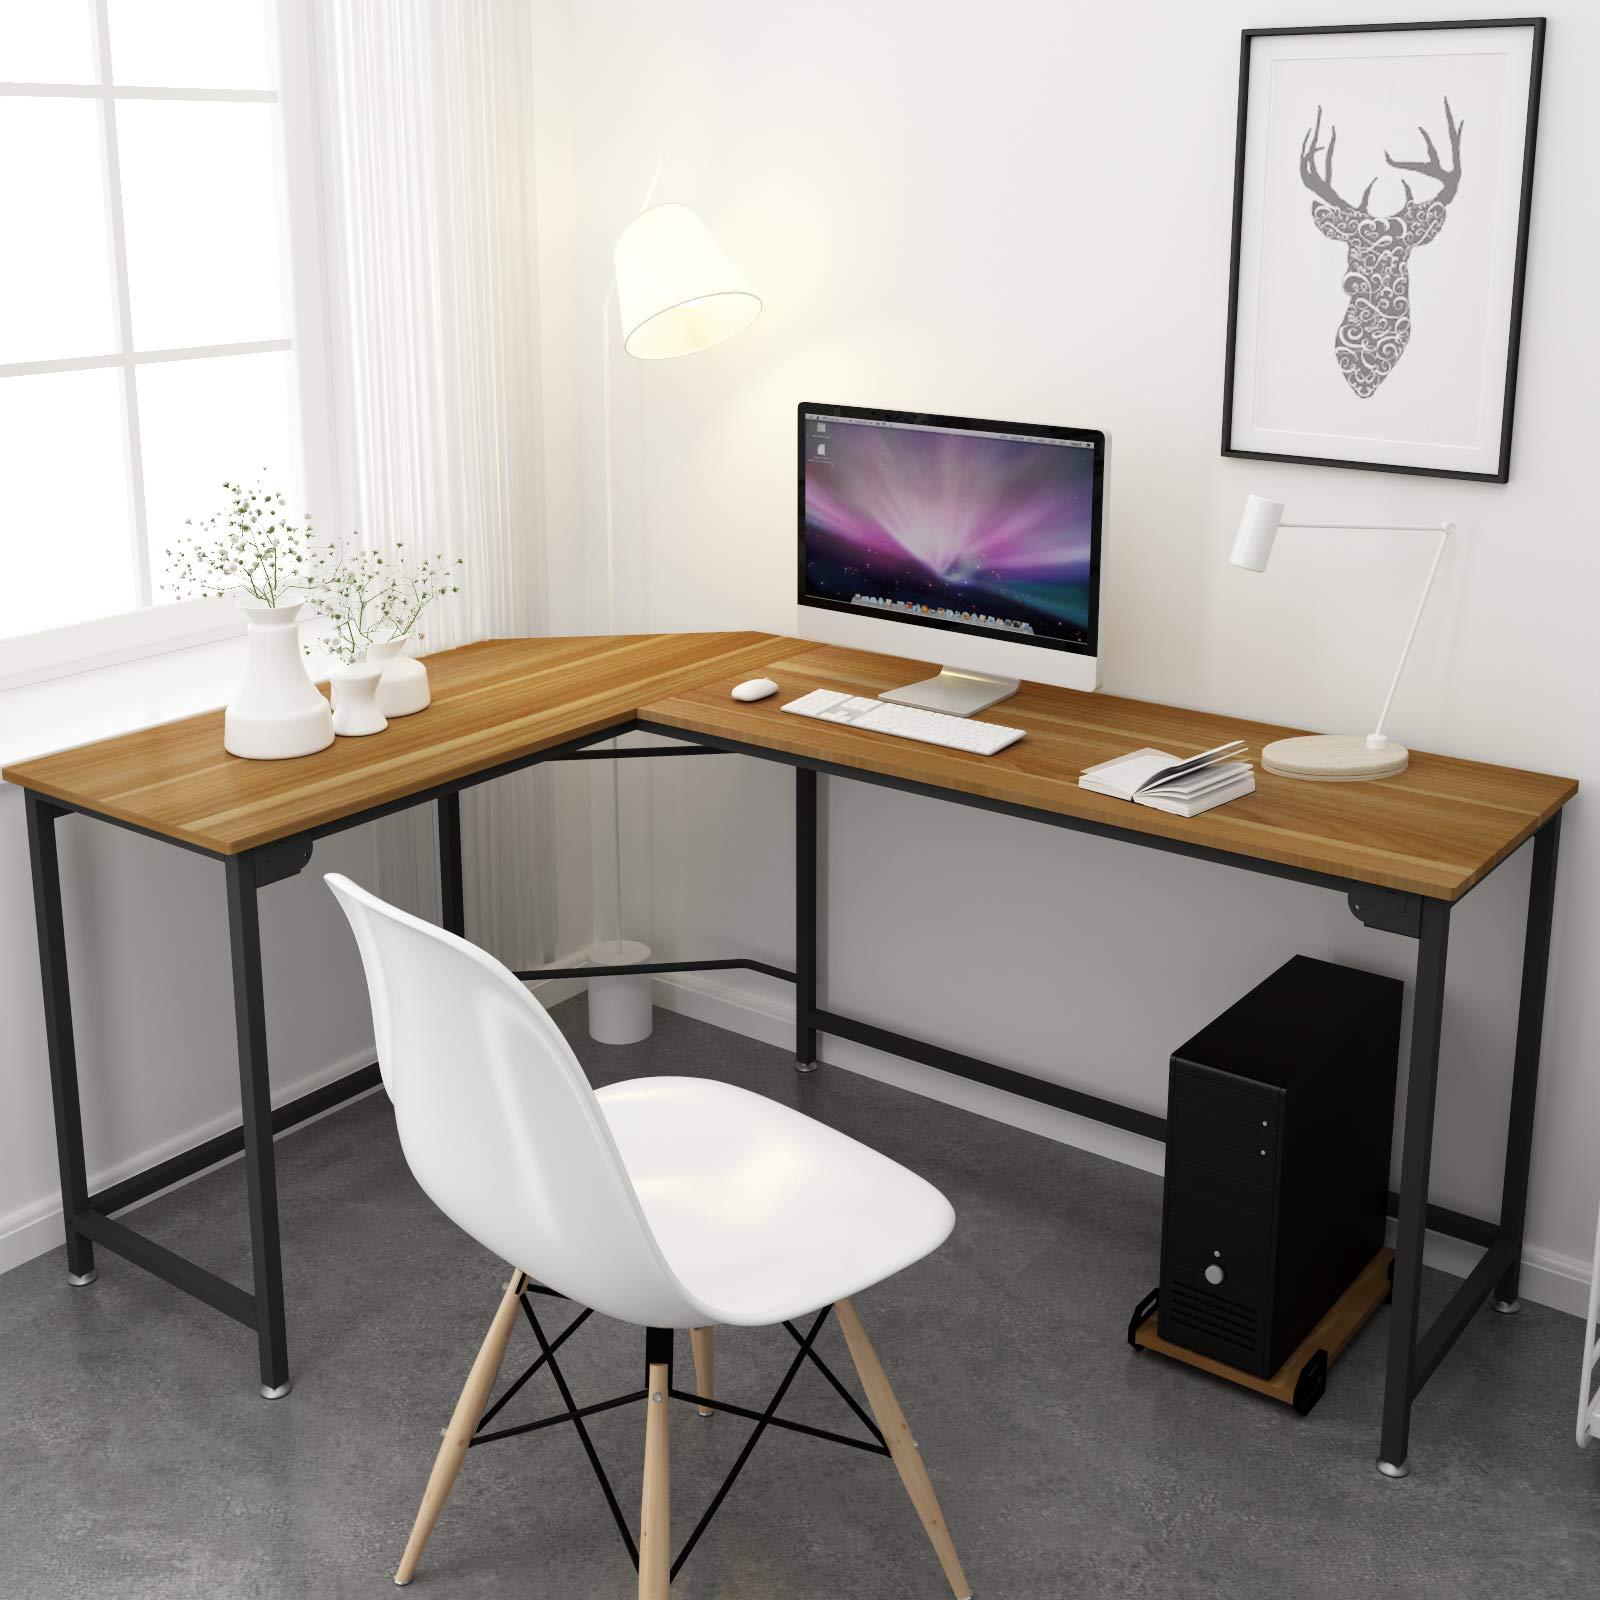 Simlife L-Shaped Computer Desk Office Corner Workstation Simple Modern Design Gaming Laptop Study Table Wood & Metal,Walnut by simlife